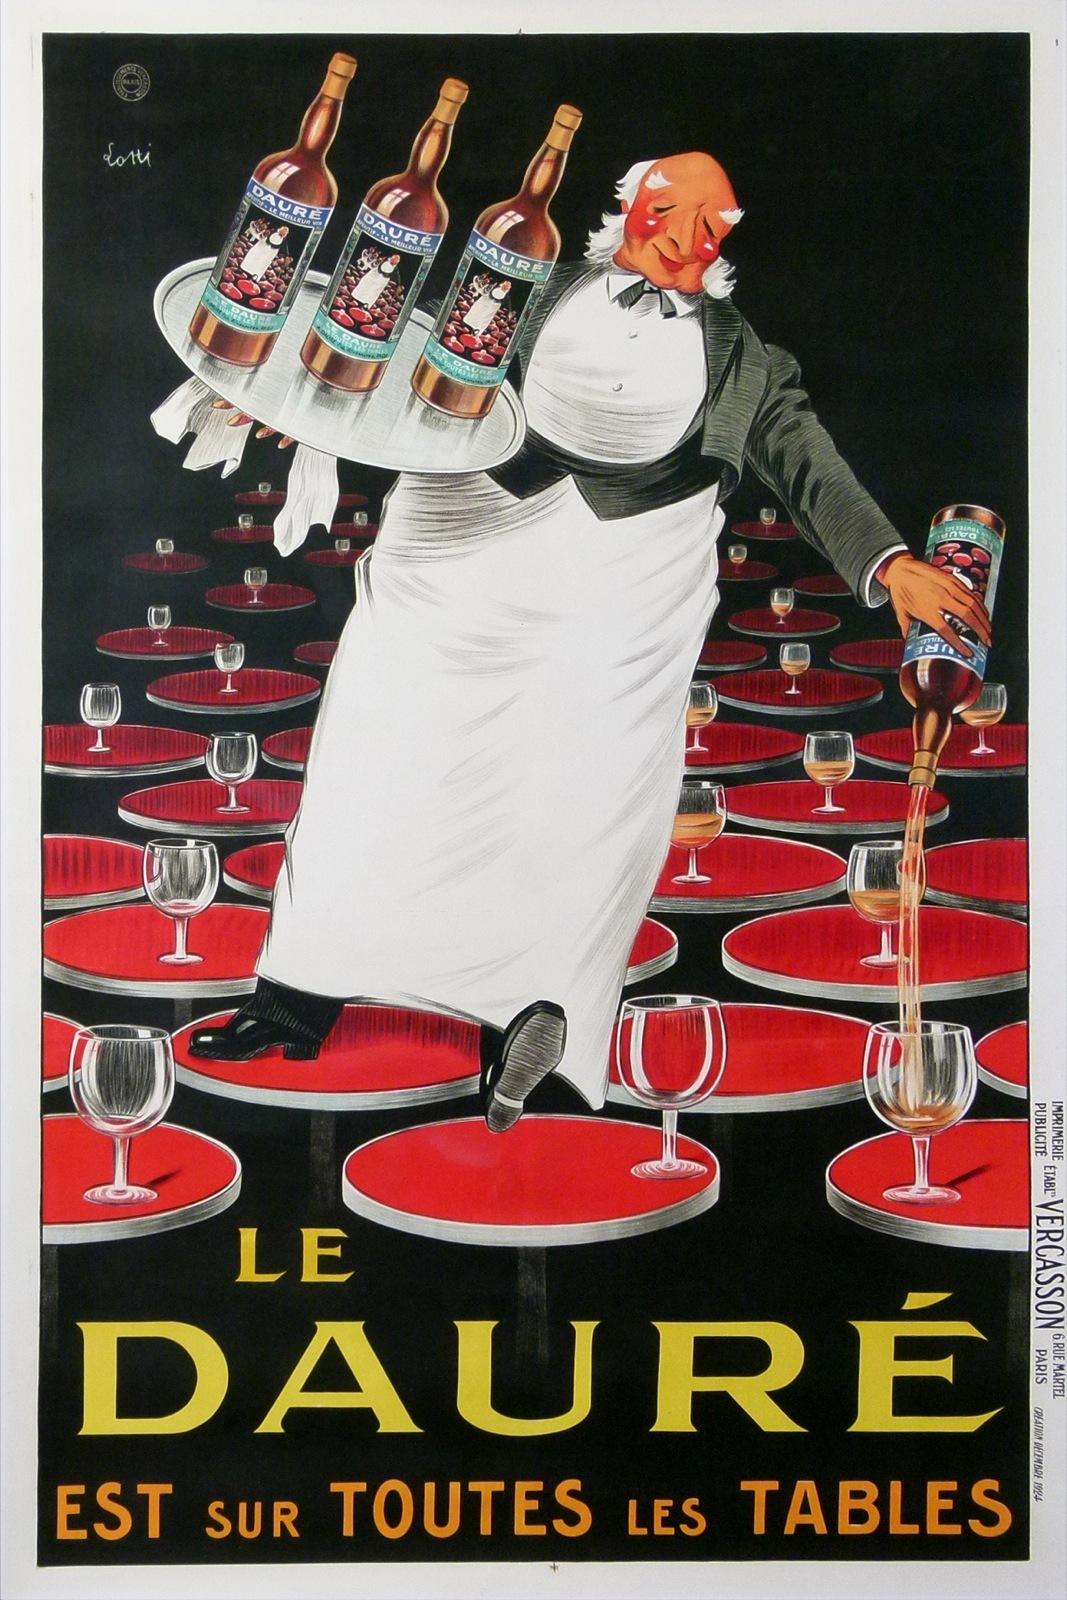 lotti_1924_daure_liquor_french_art-deco_ad_droste_effec